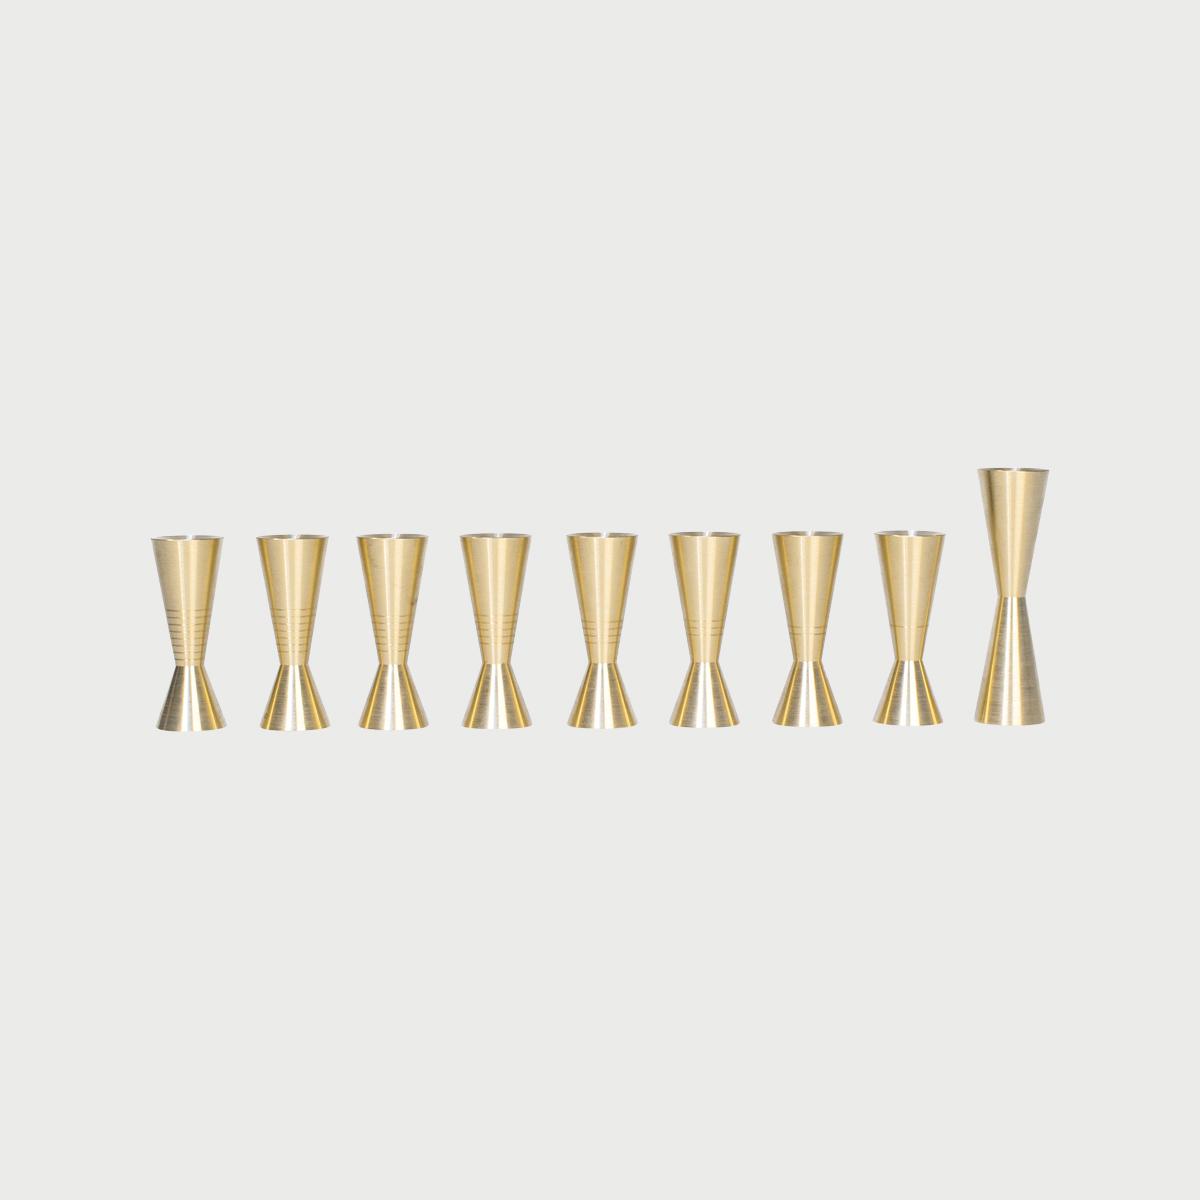 Counting menorah straight line  282 29